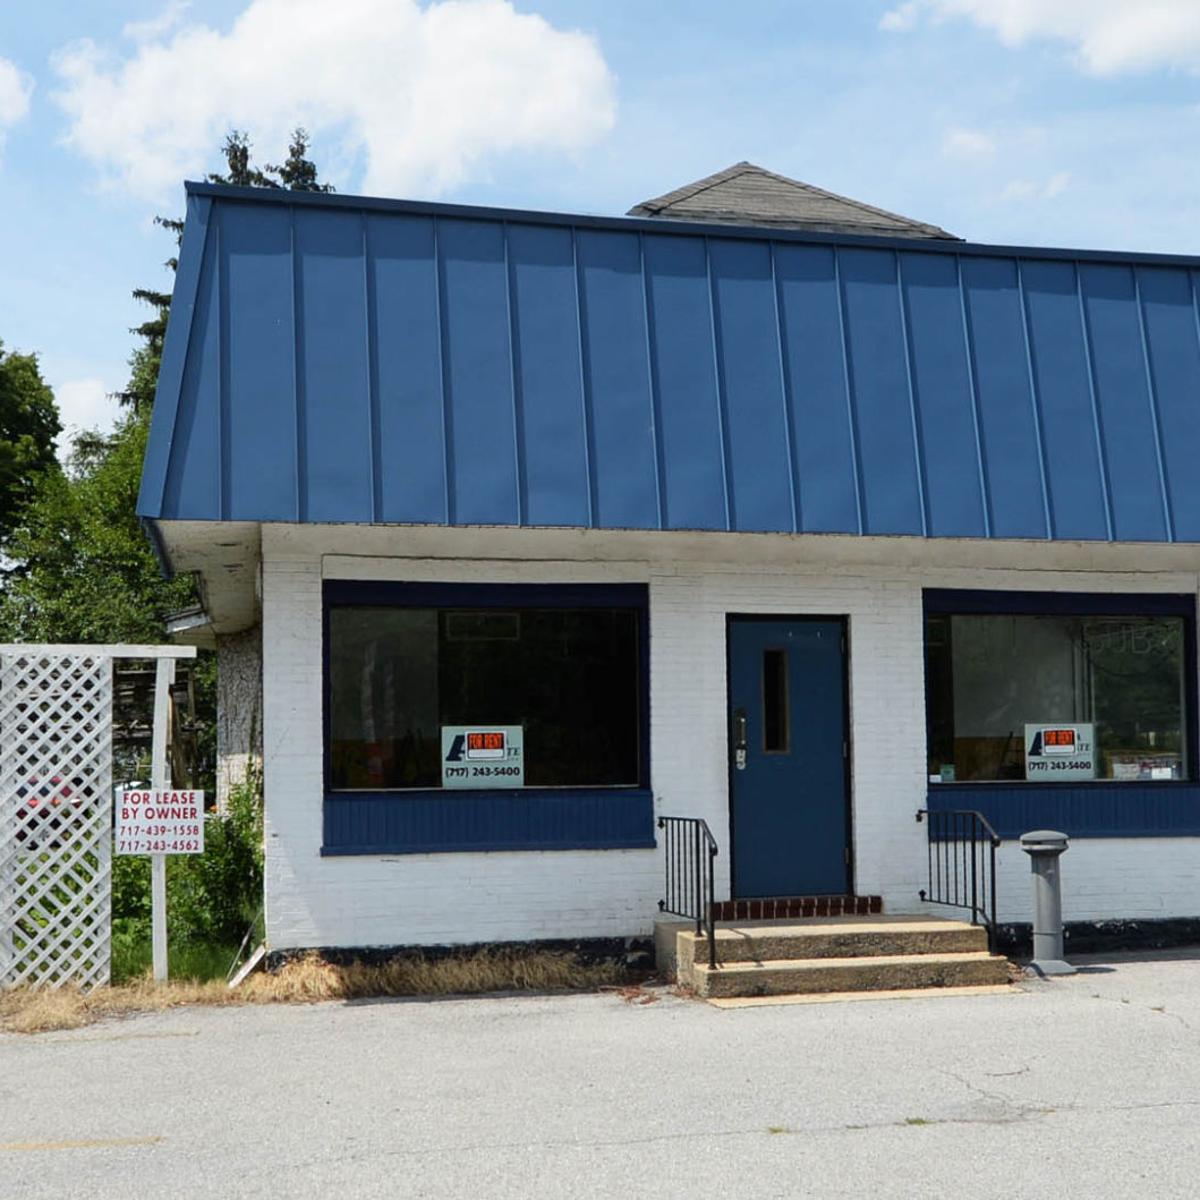 Two medical marijuana dispensaries to be located in